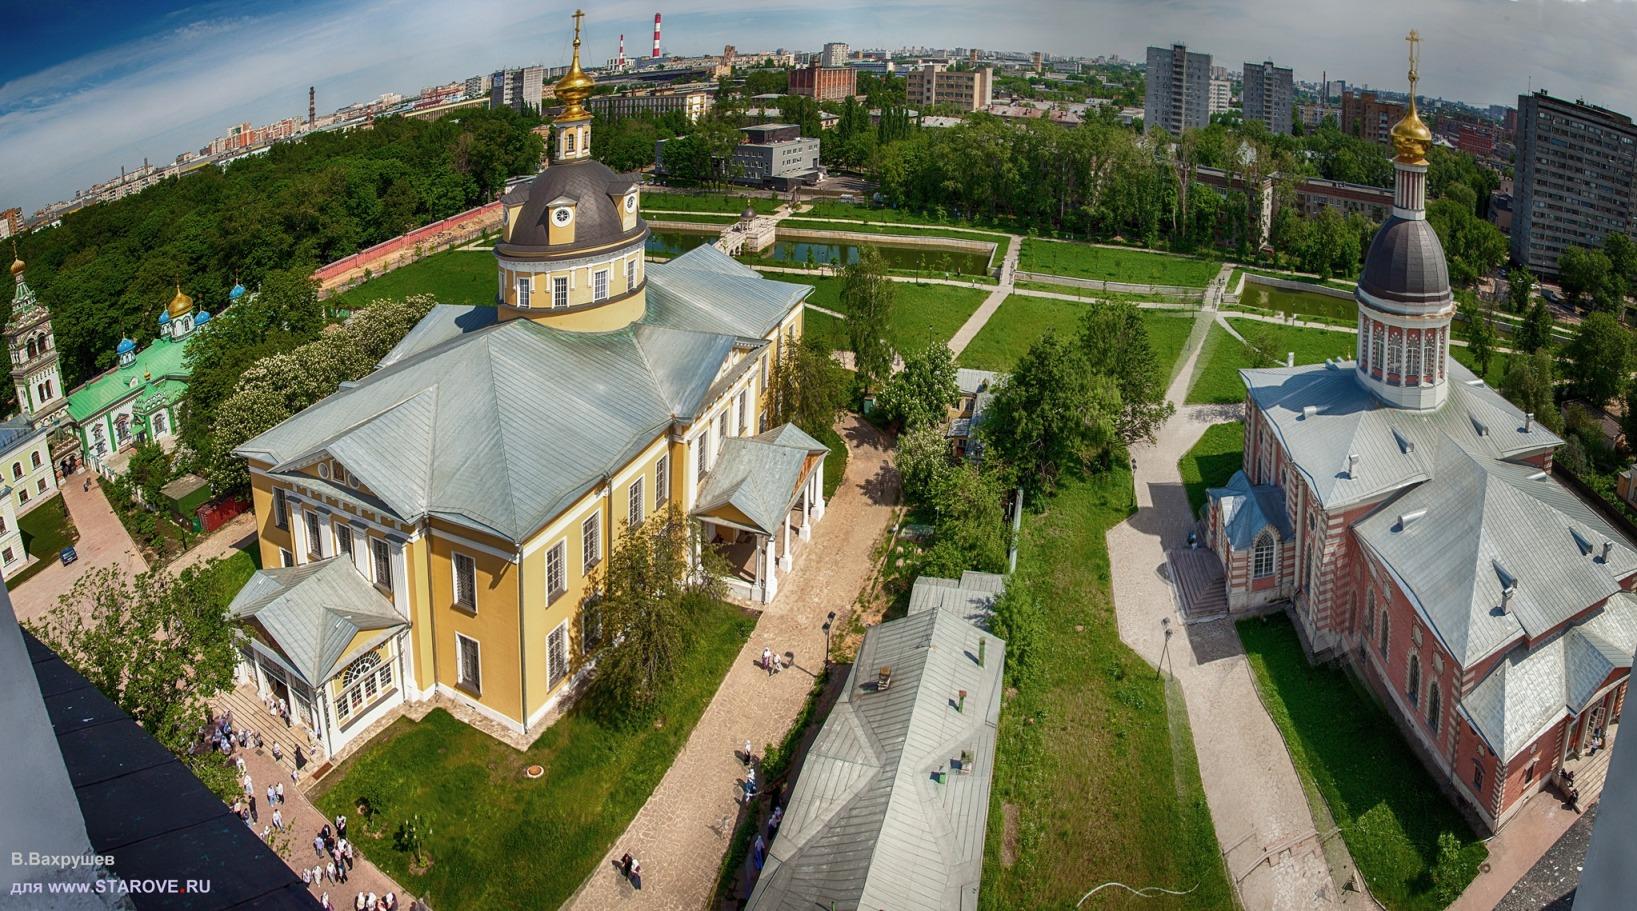 RGJ-Panorama-SiteStarove.RU_